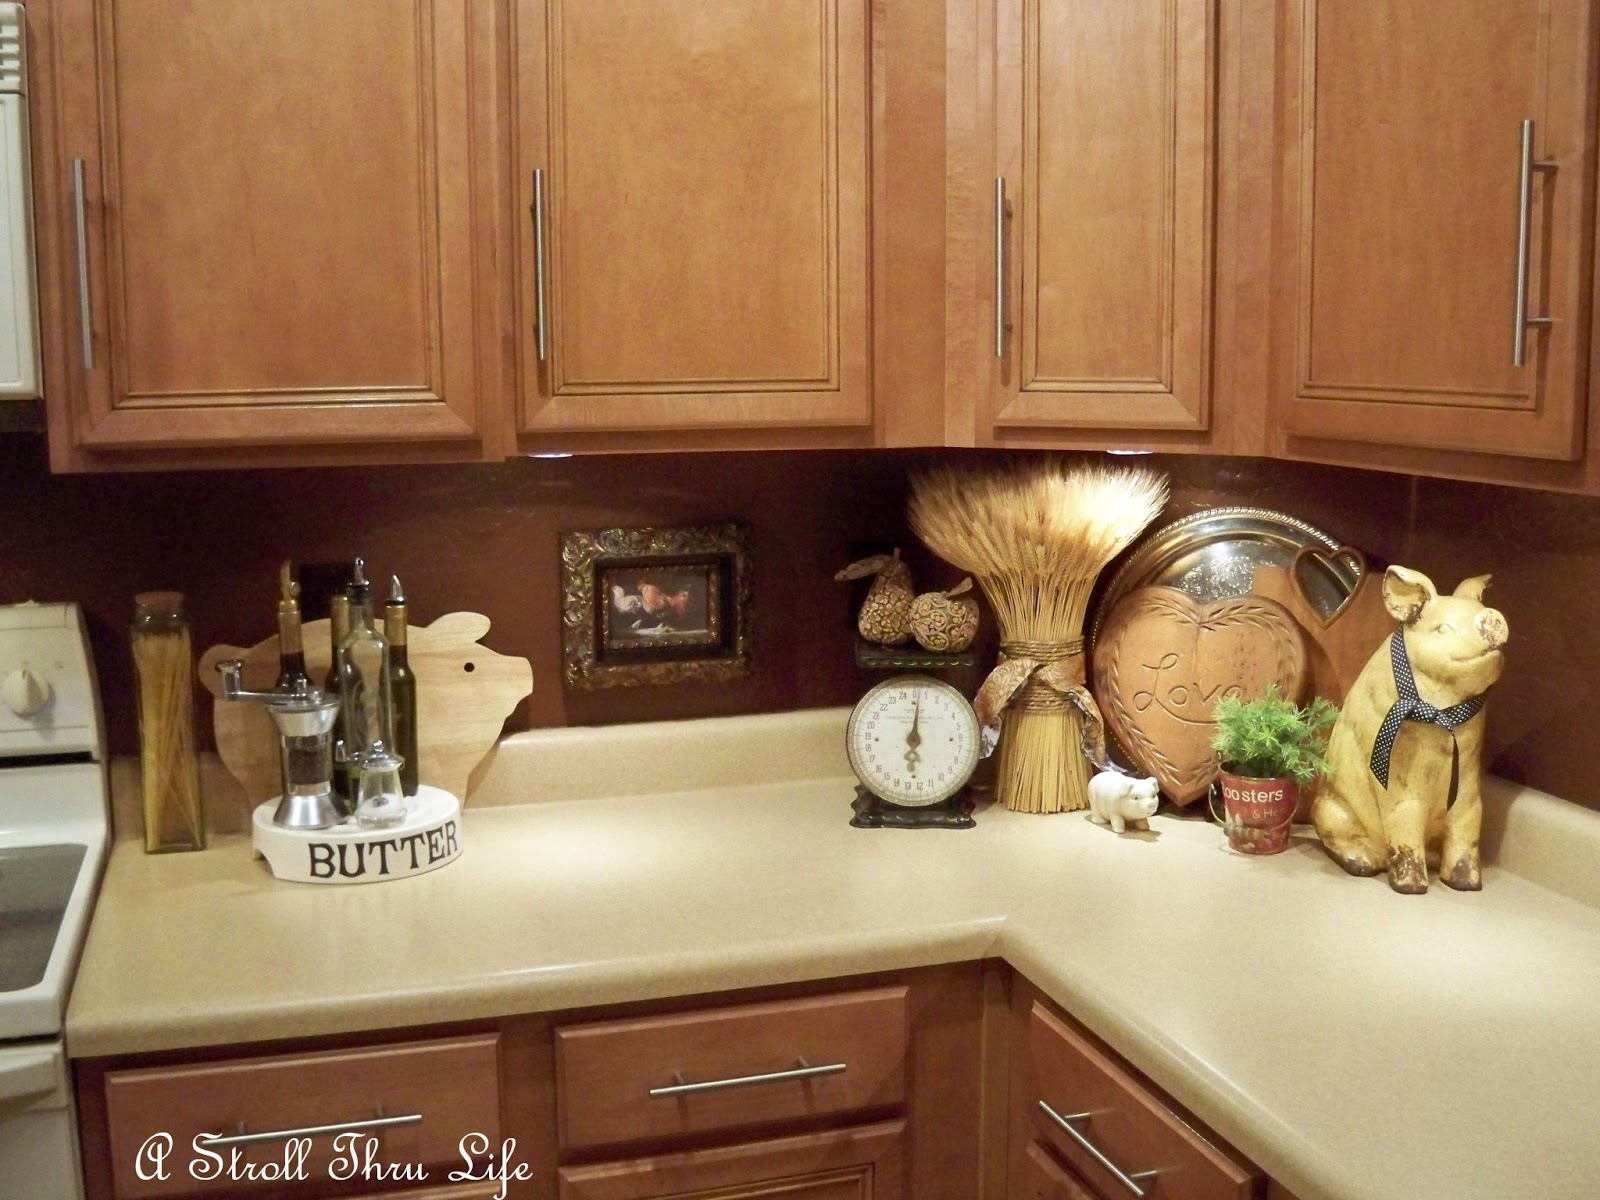 A Stroll Thru Life: Decorating With Bread/Cutting Boards